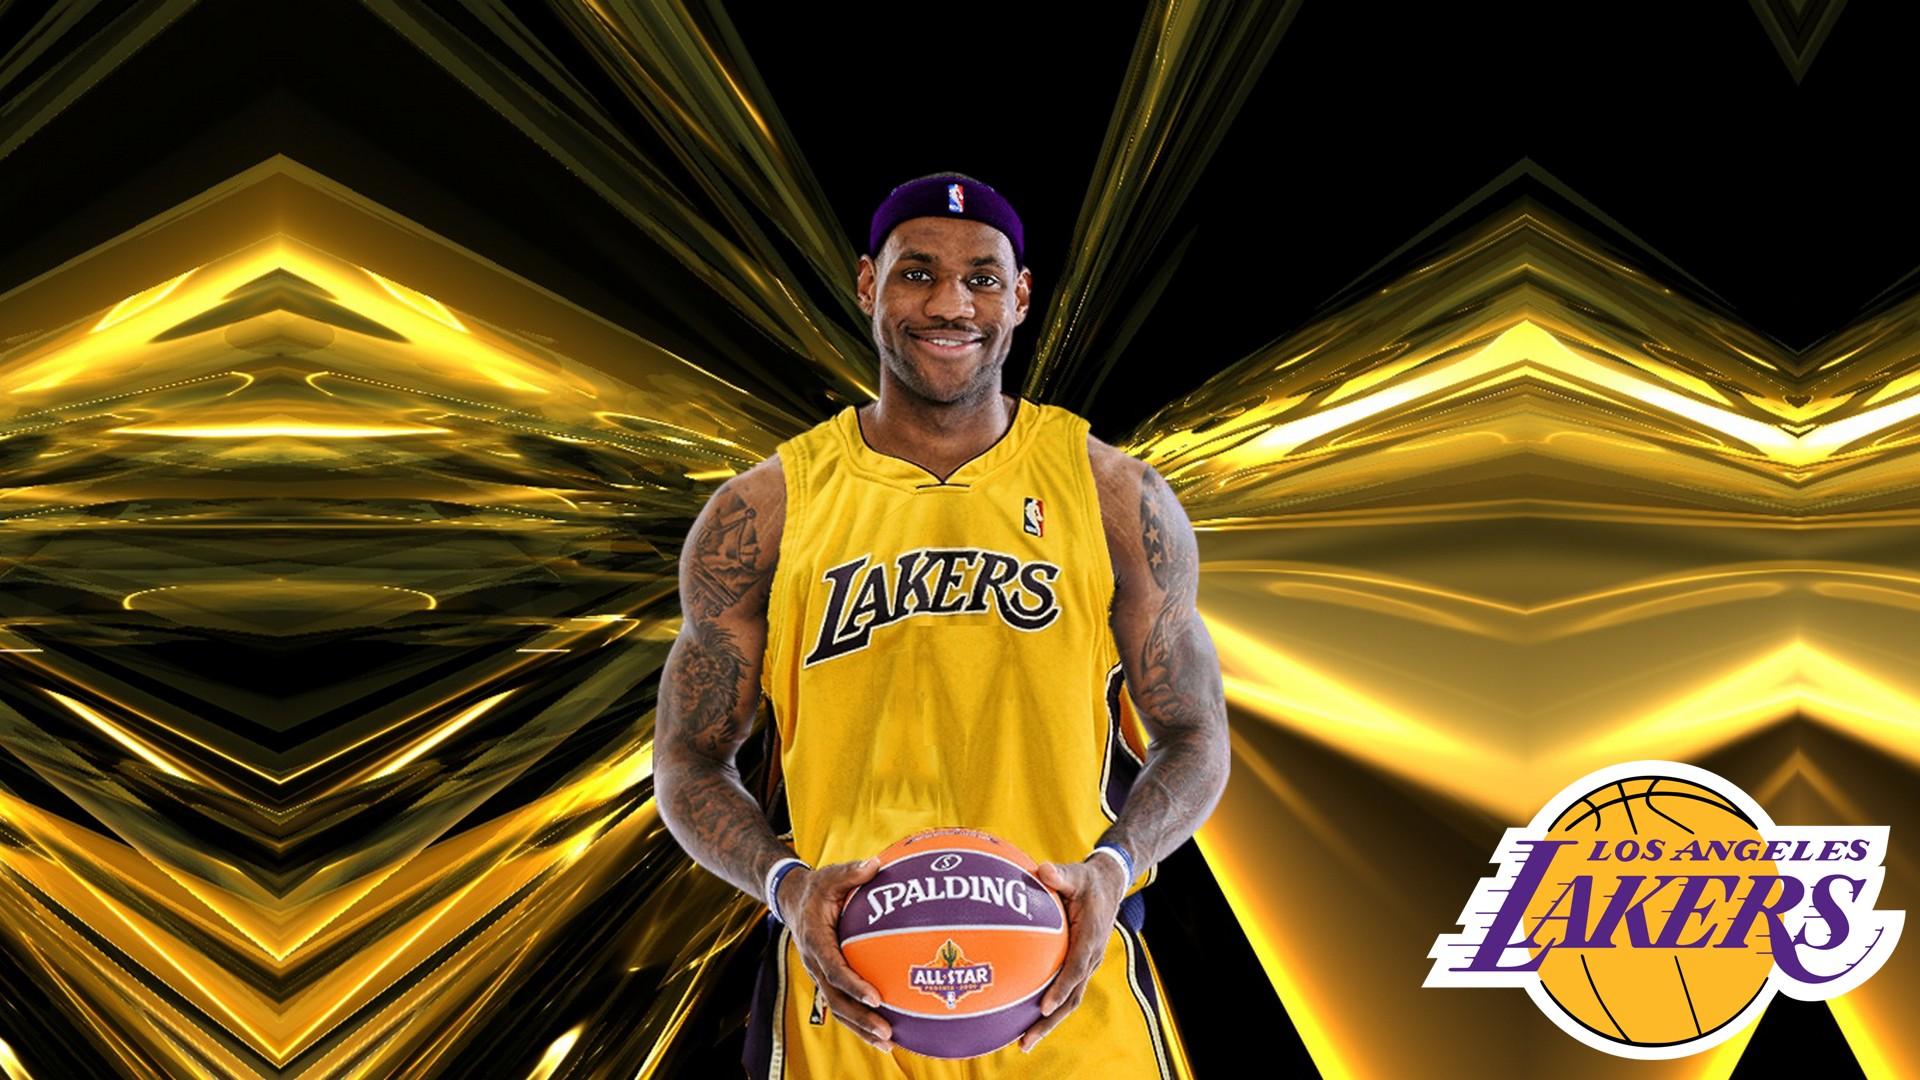 Wallpapers HD LeBron James LA Lakers 2020 Basketball Wallpaper 1920x1080